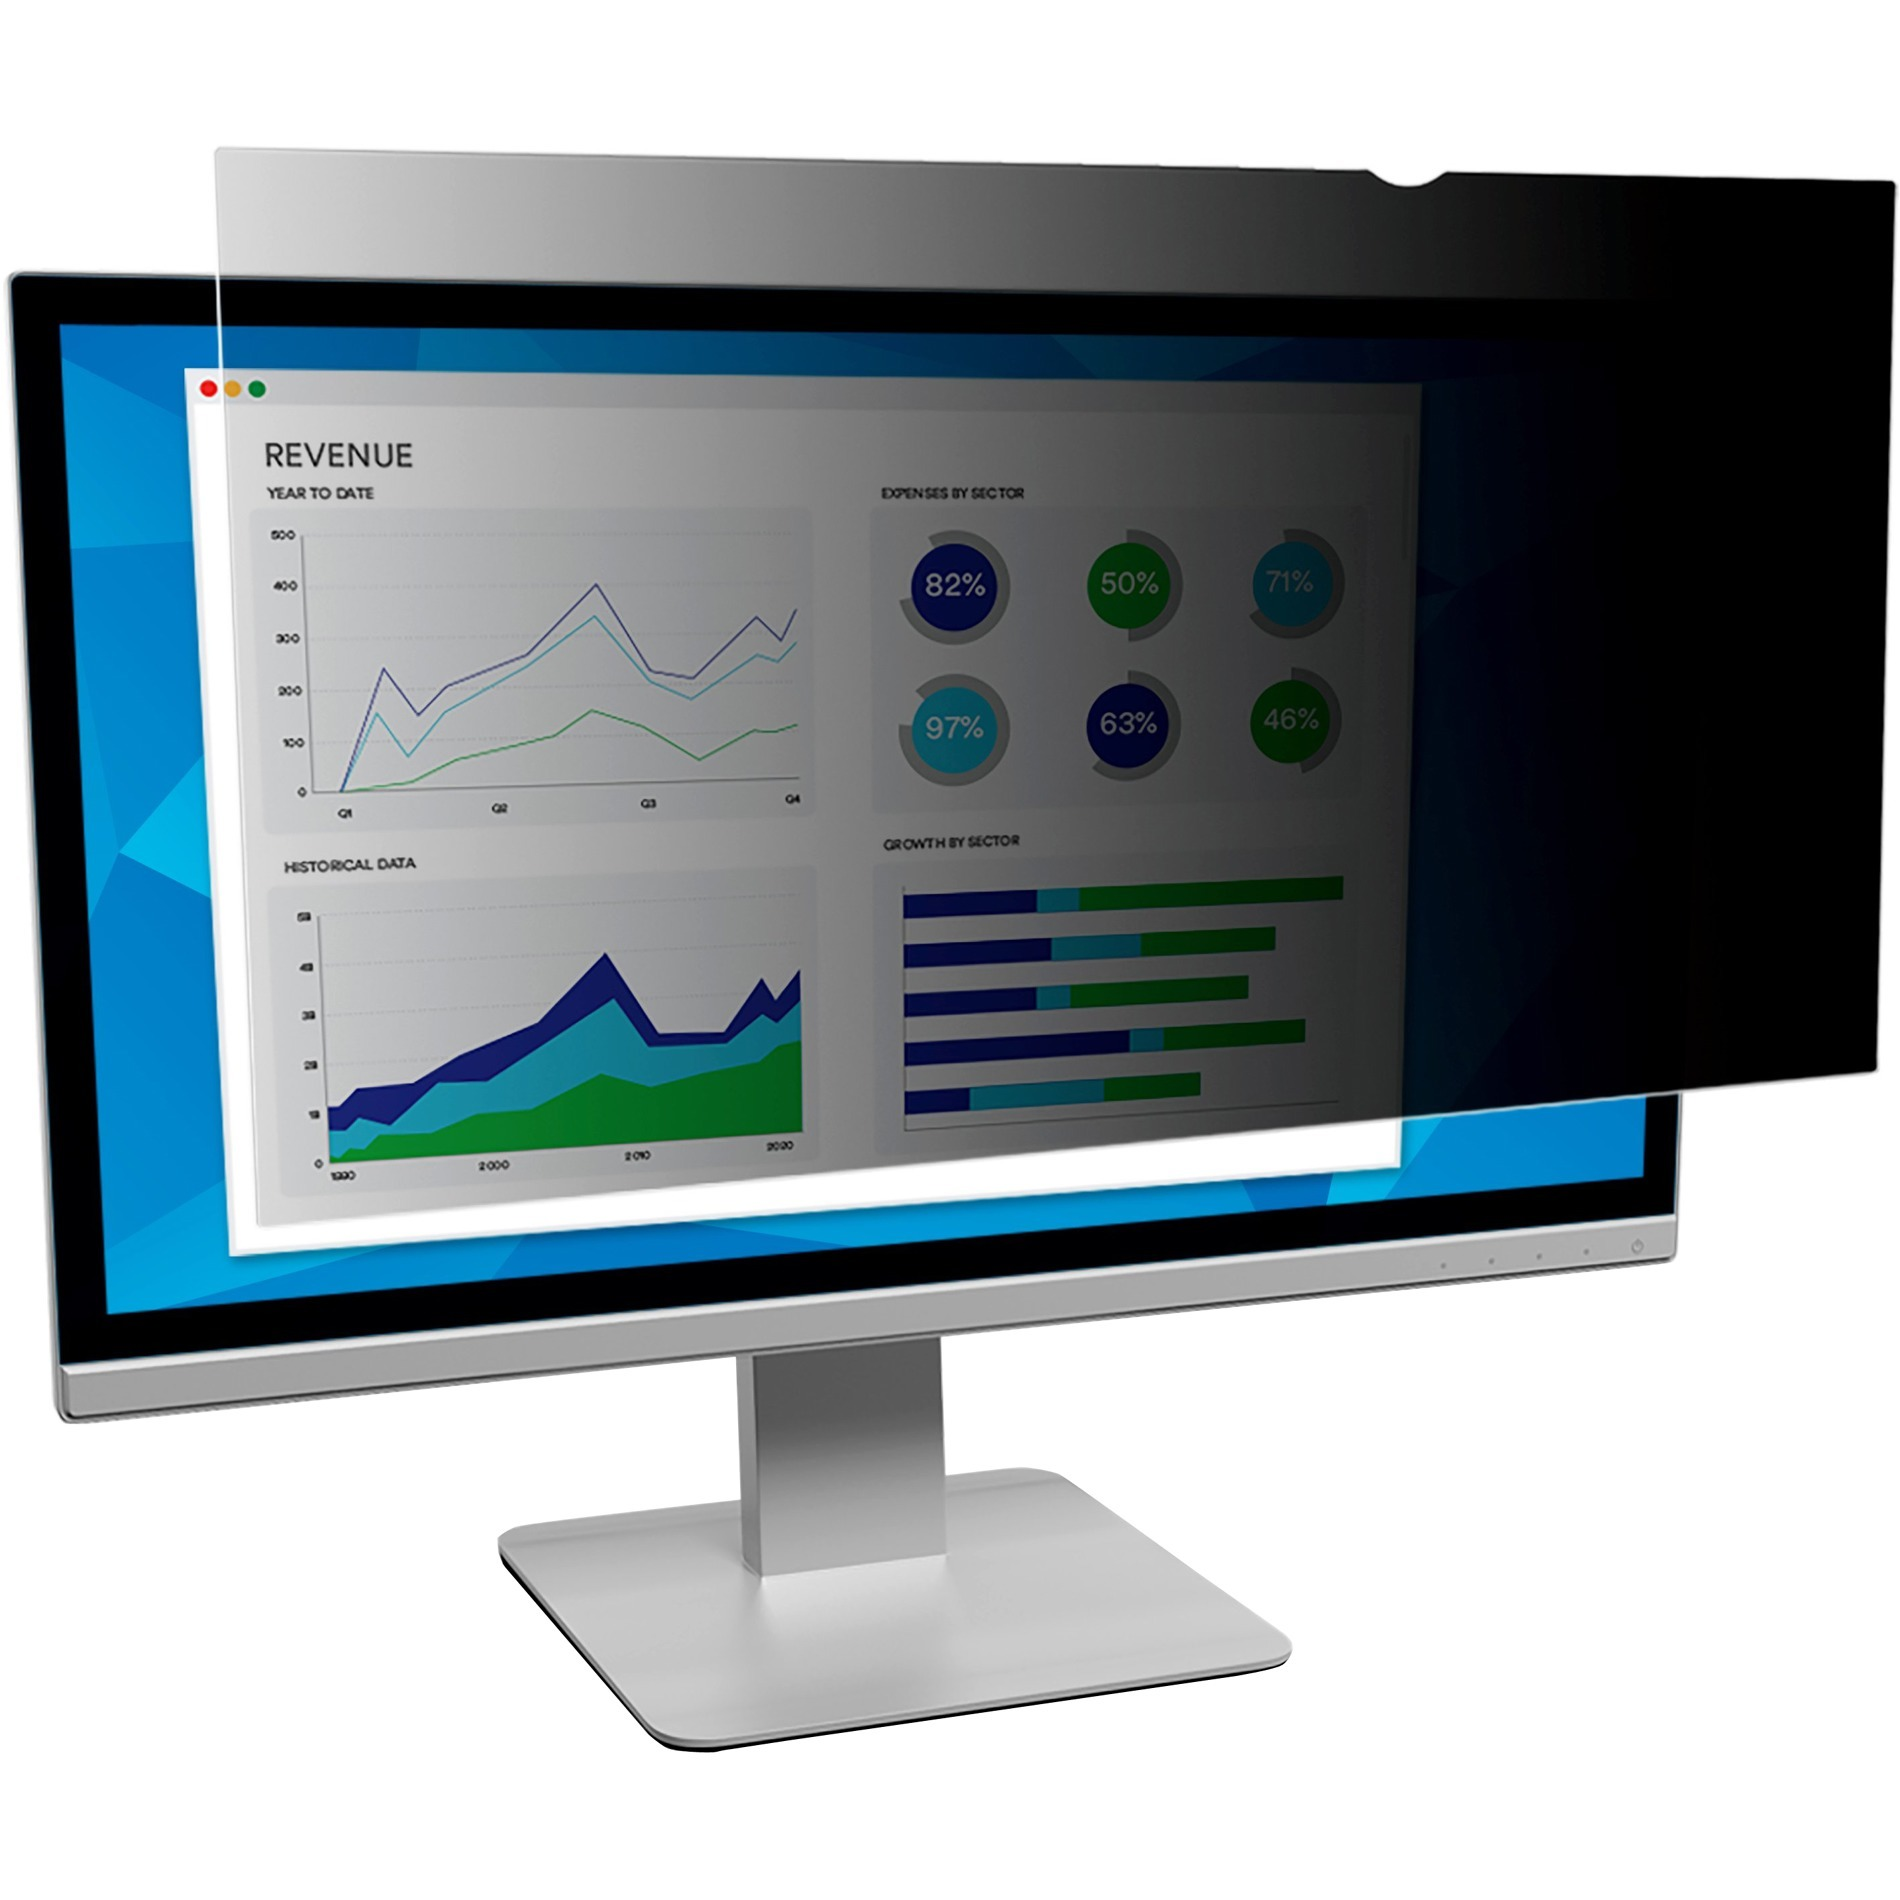 "3M, MMMPF200W9B, Privacy Filter for 20"" Widescreen Monitor (PF200W9B), Black,Matte,Glossy"